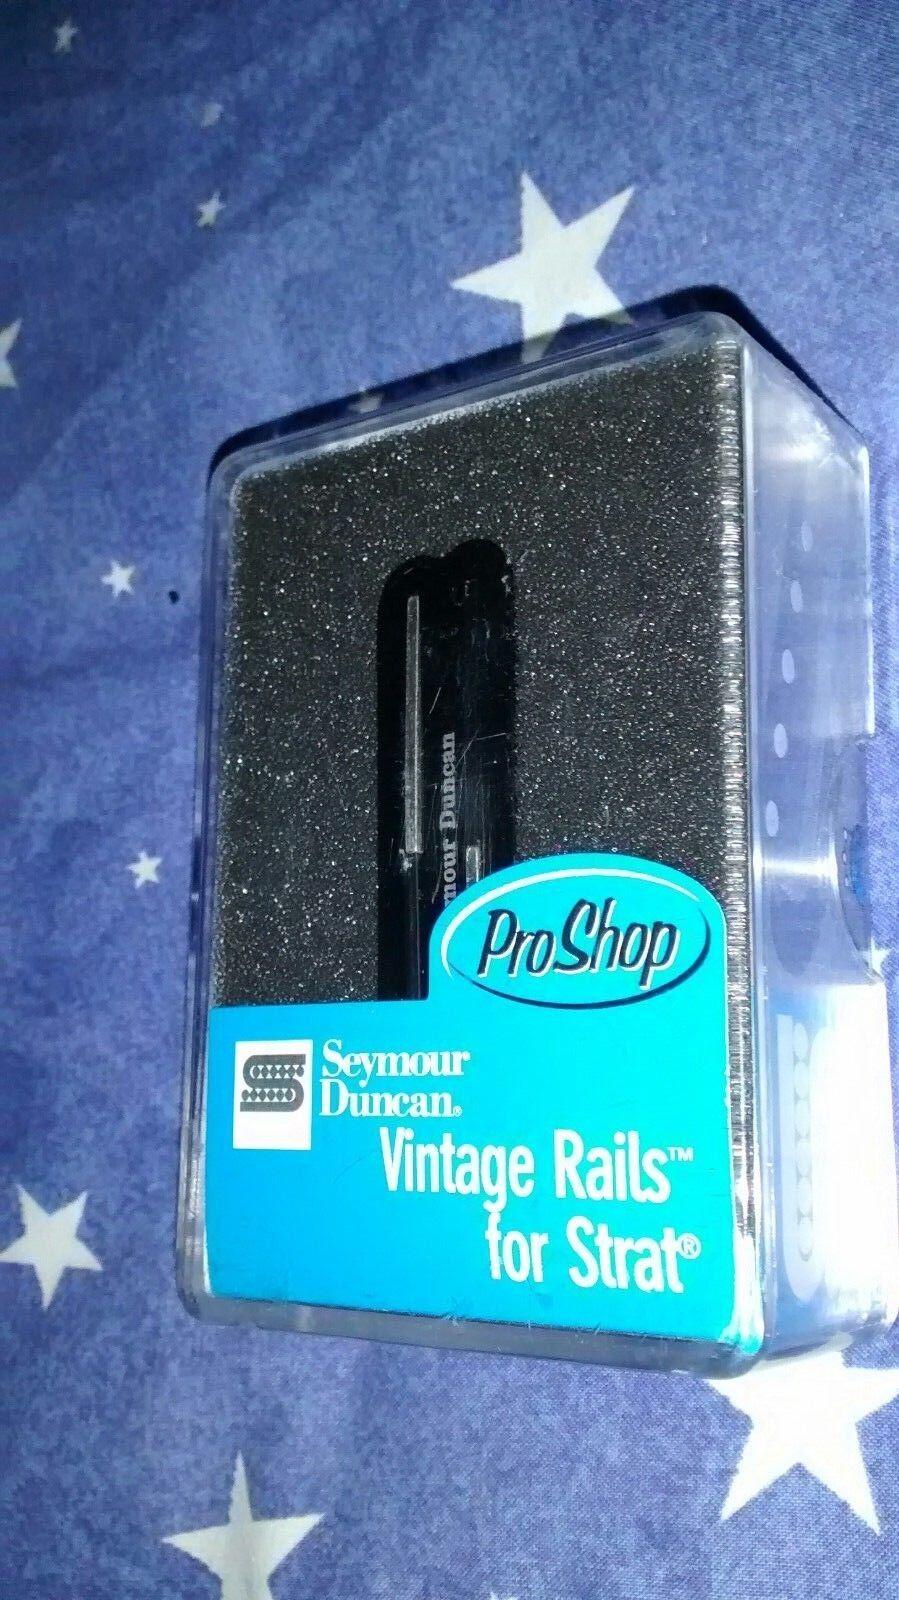 Seymour Duncan Vintage Rails, for Strat Größe. Guitar humbucker pickup